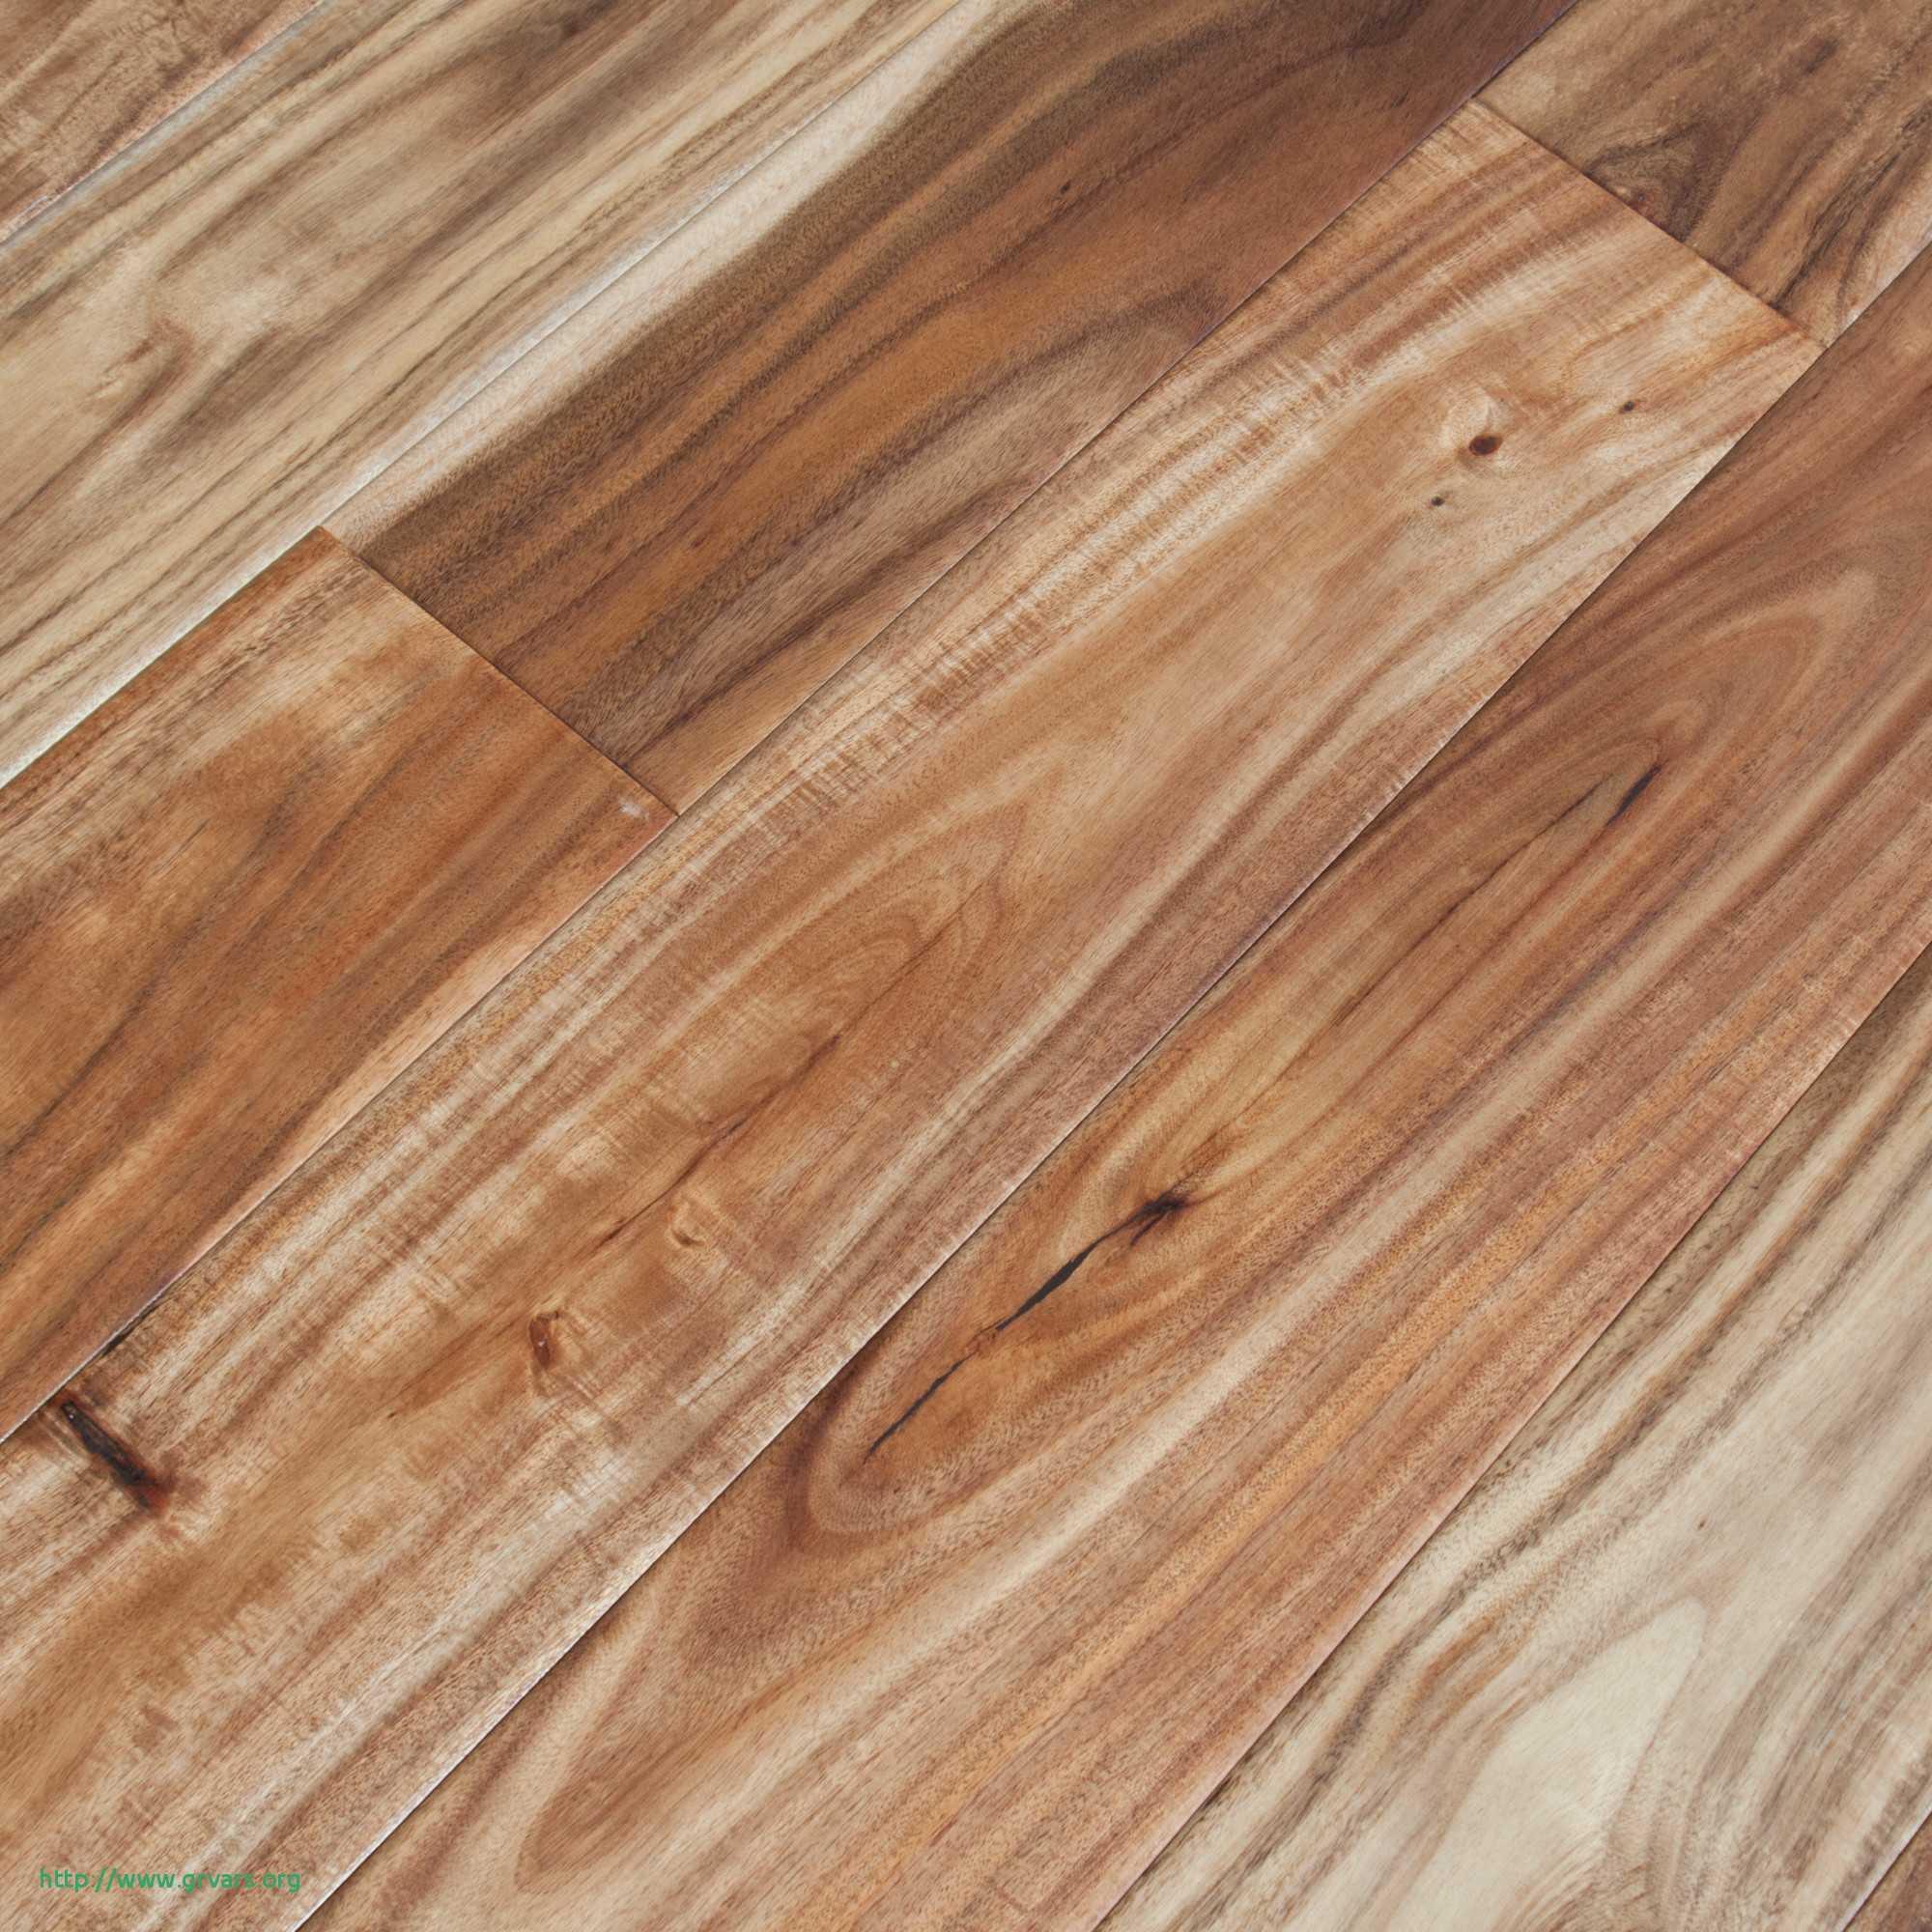 hand scraped hardwood flooring canada of 20 unique hardwood floor plank sizes ideas blog throughout hardwood floor plank sizes beau 9 mile creek acacia hand scraped